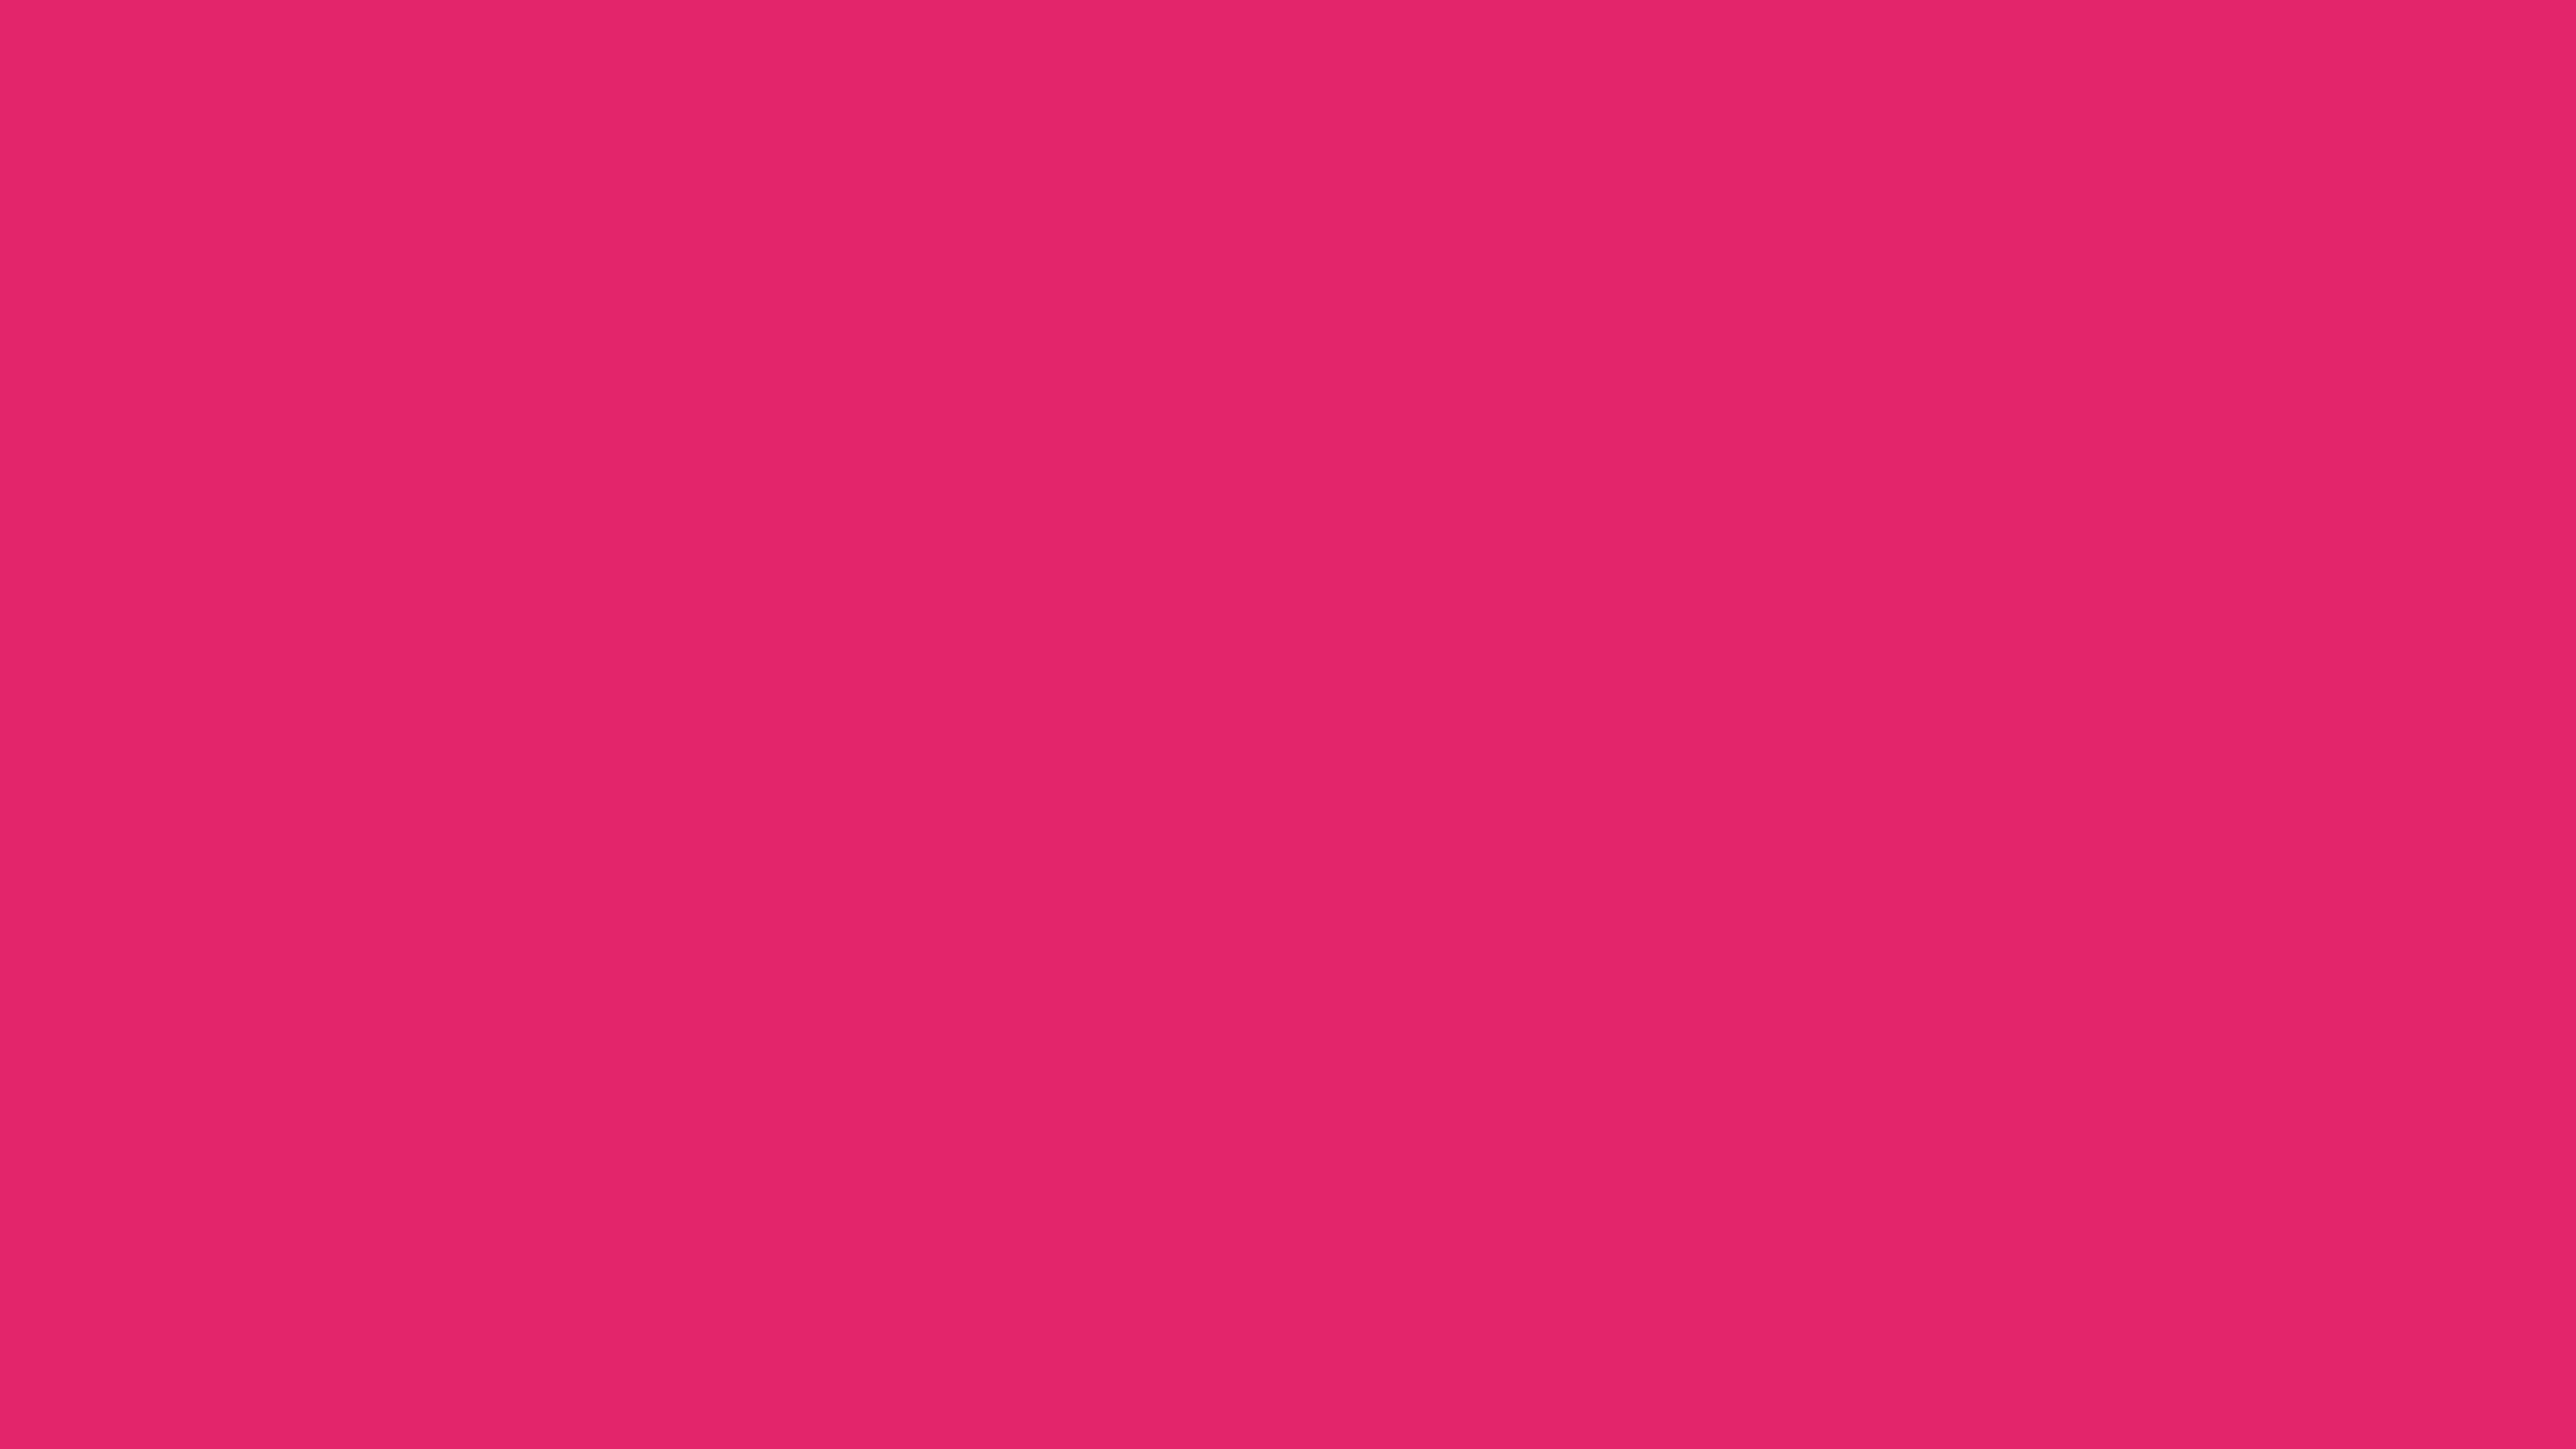 5120x2880 Razzmatazz Solid Color Background